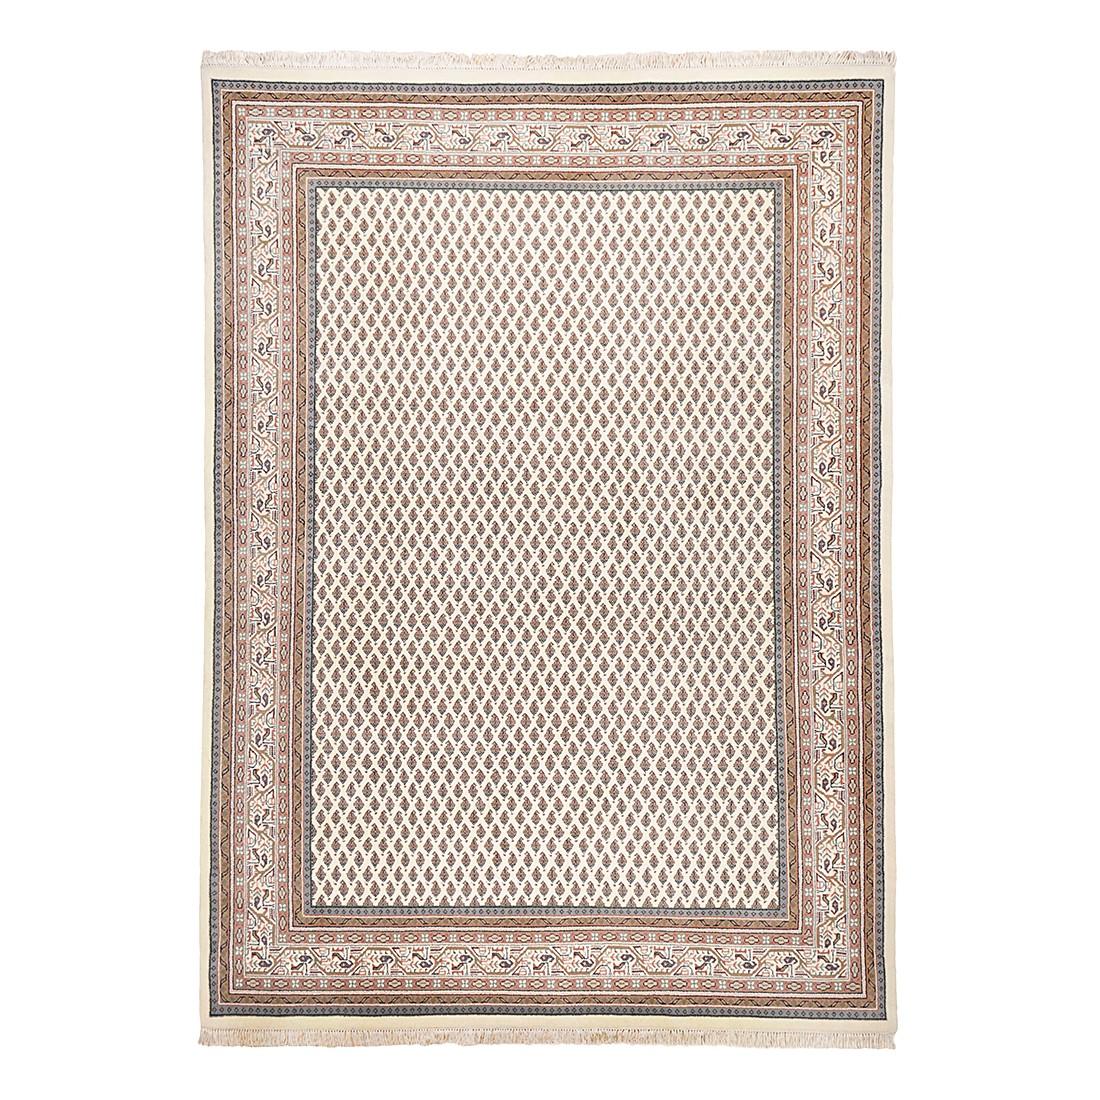 Teppich Abbas Meraj Mir - Wolle/Creme - 250 cm x 350 cm, Theko die markenteppiche